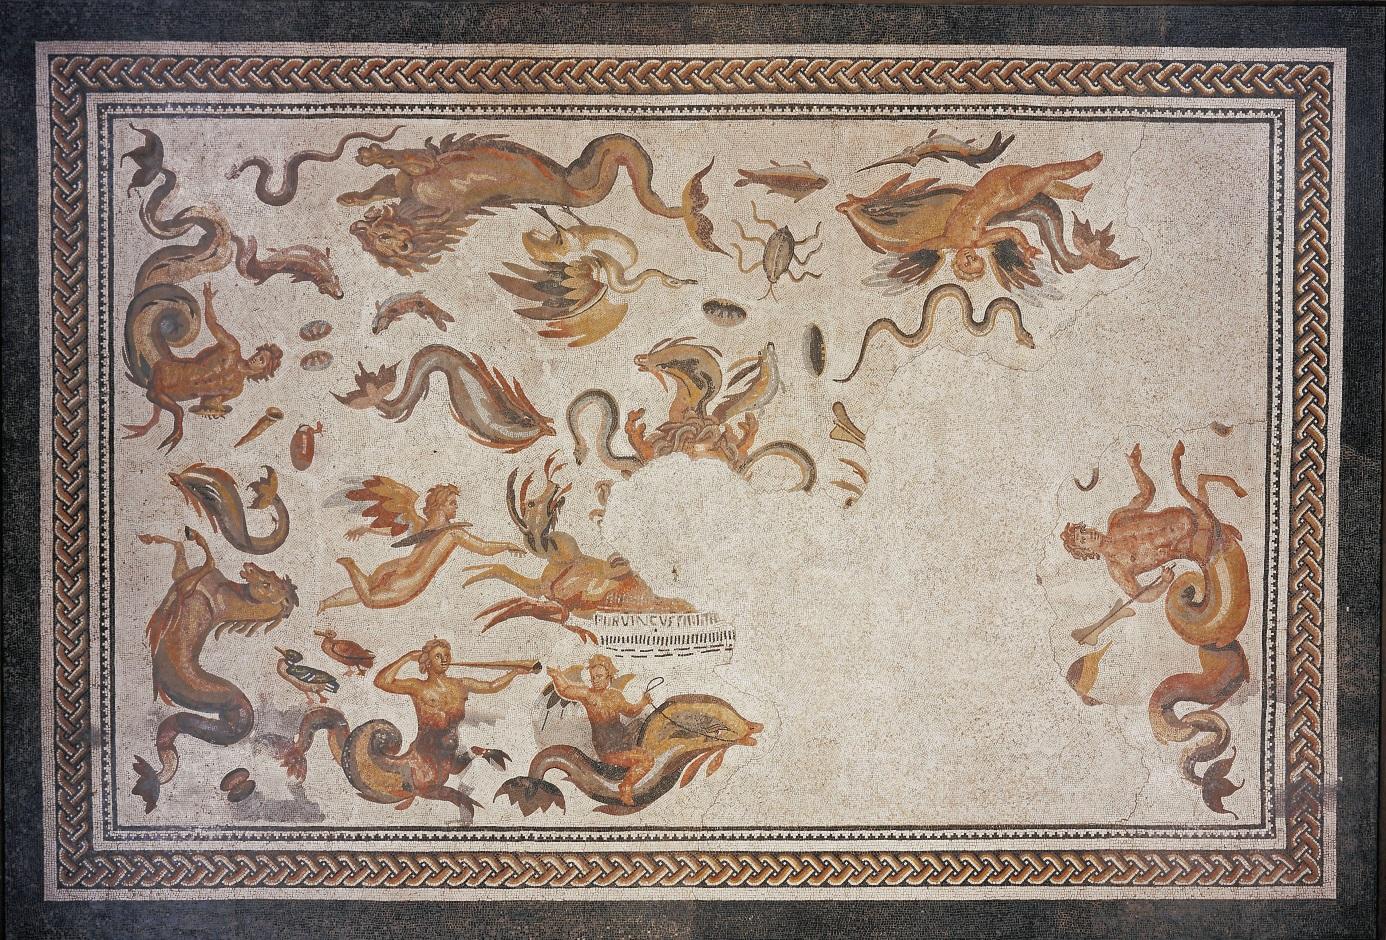 Bildergebnis für vilbeler mosaik hlmd